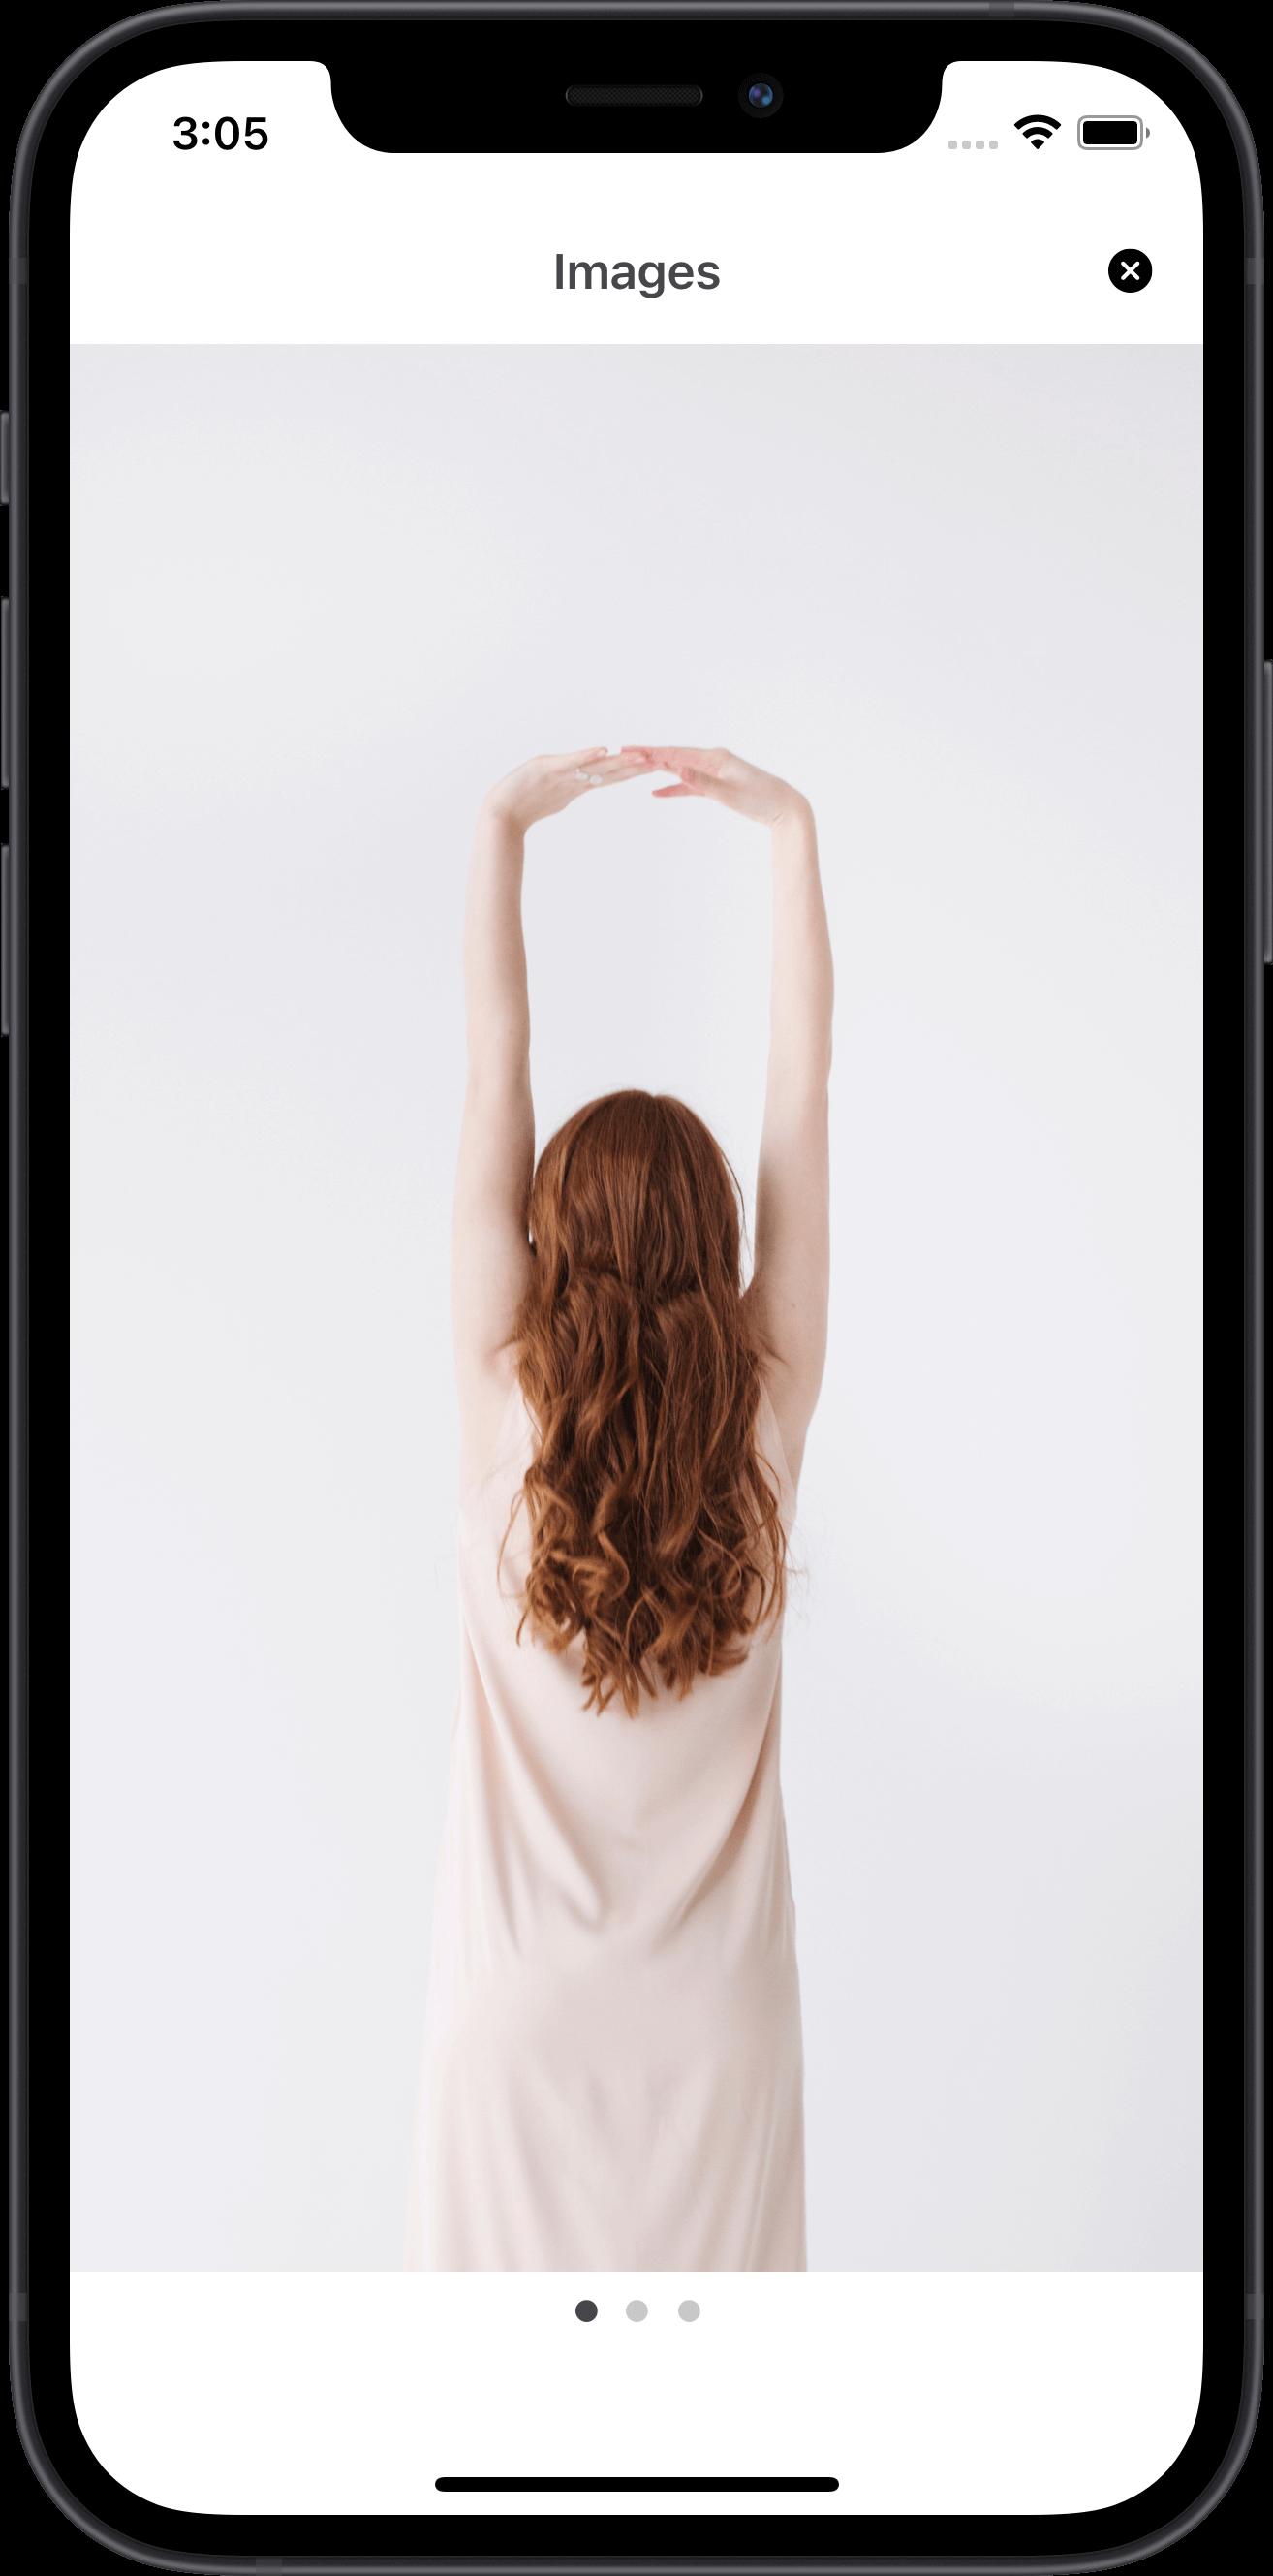 e-commerce, image, gallery